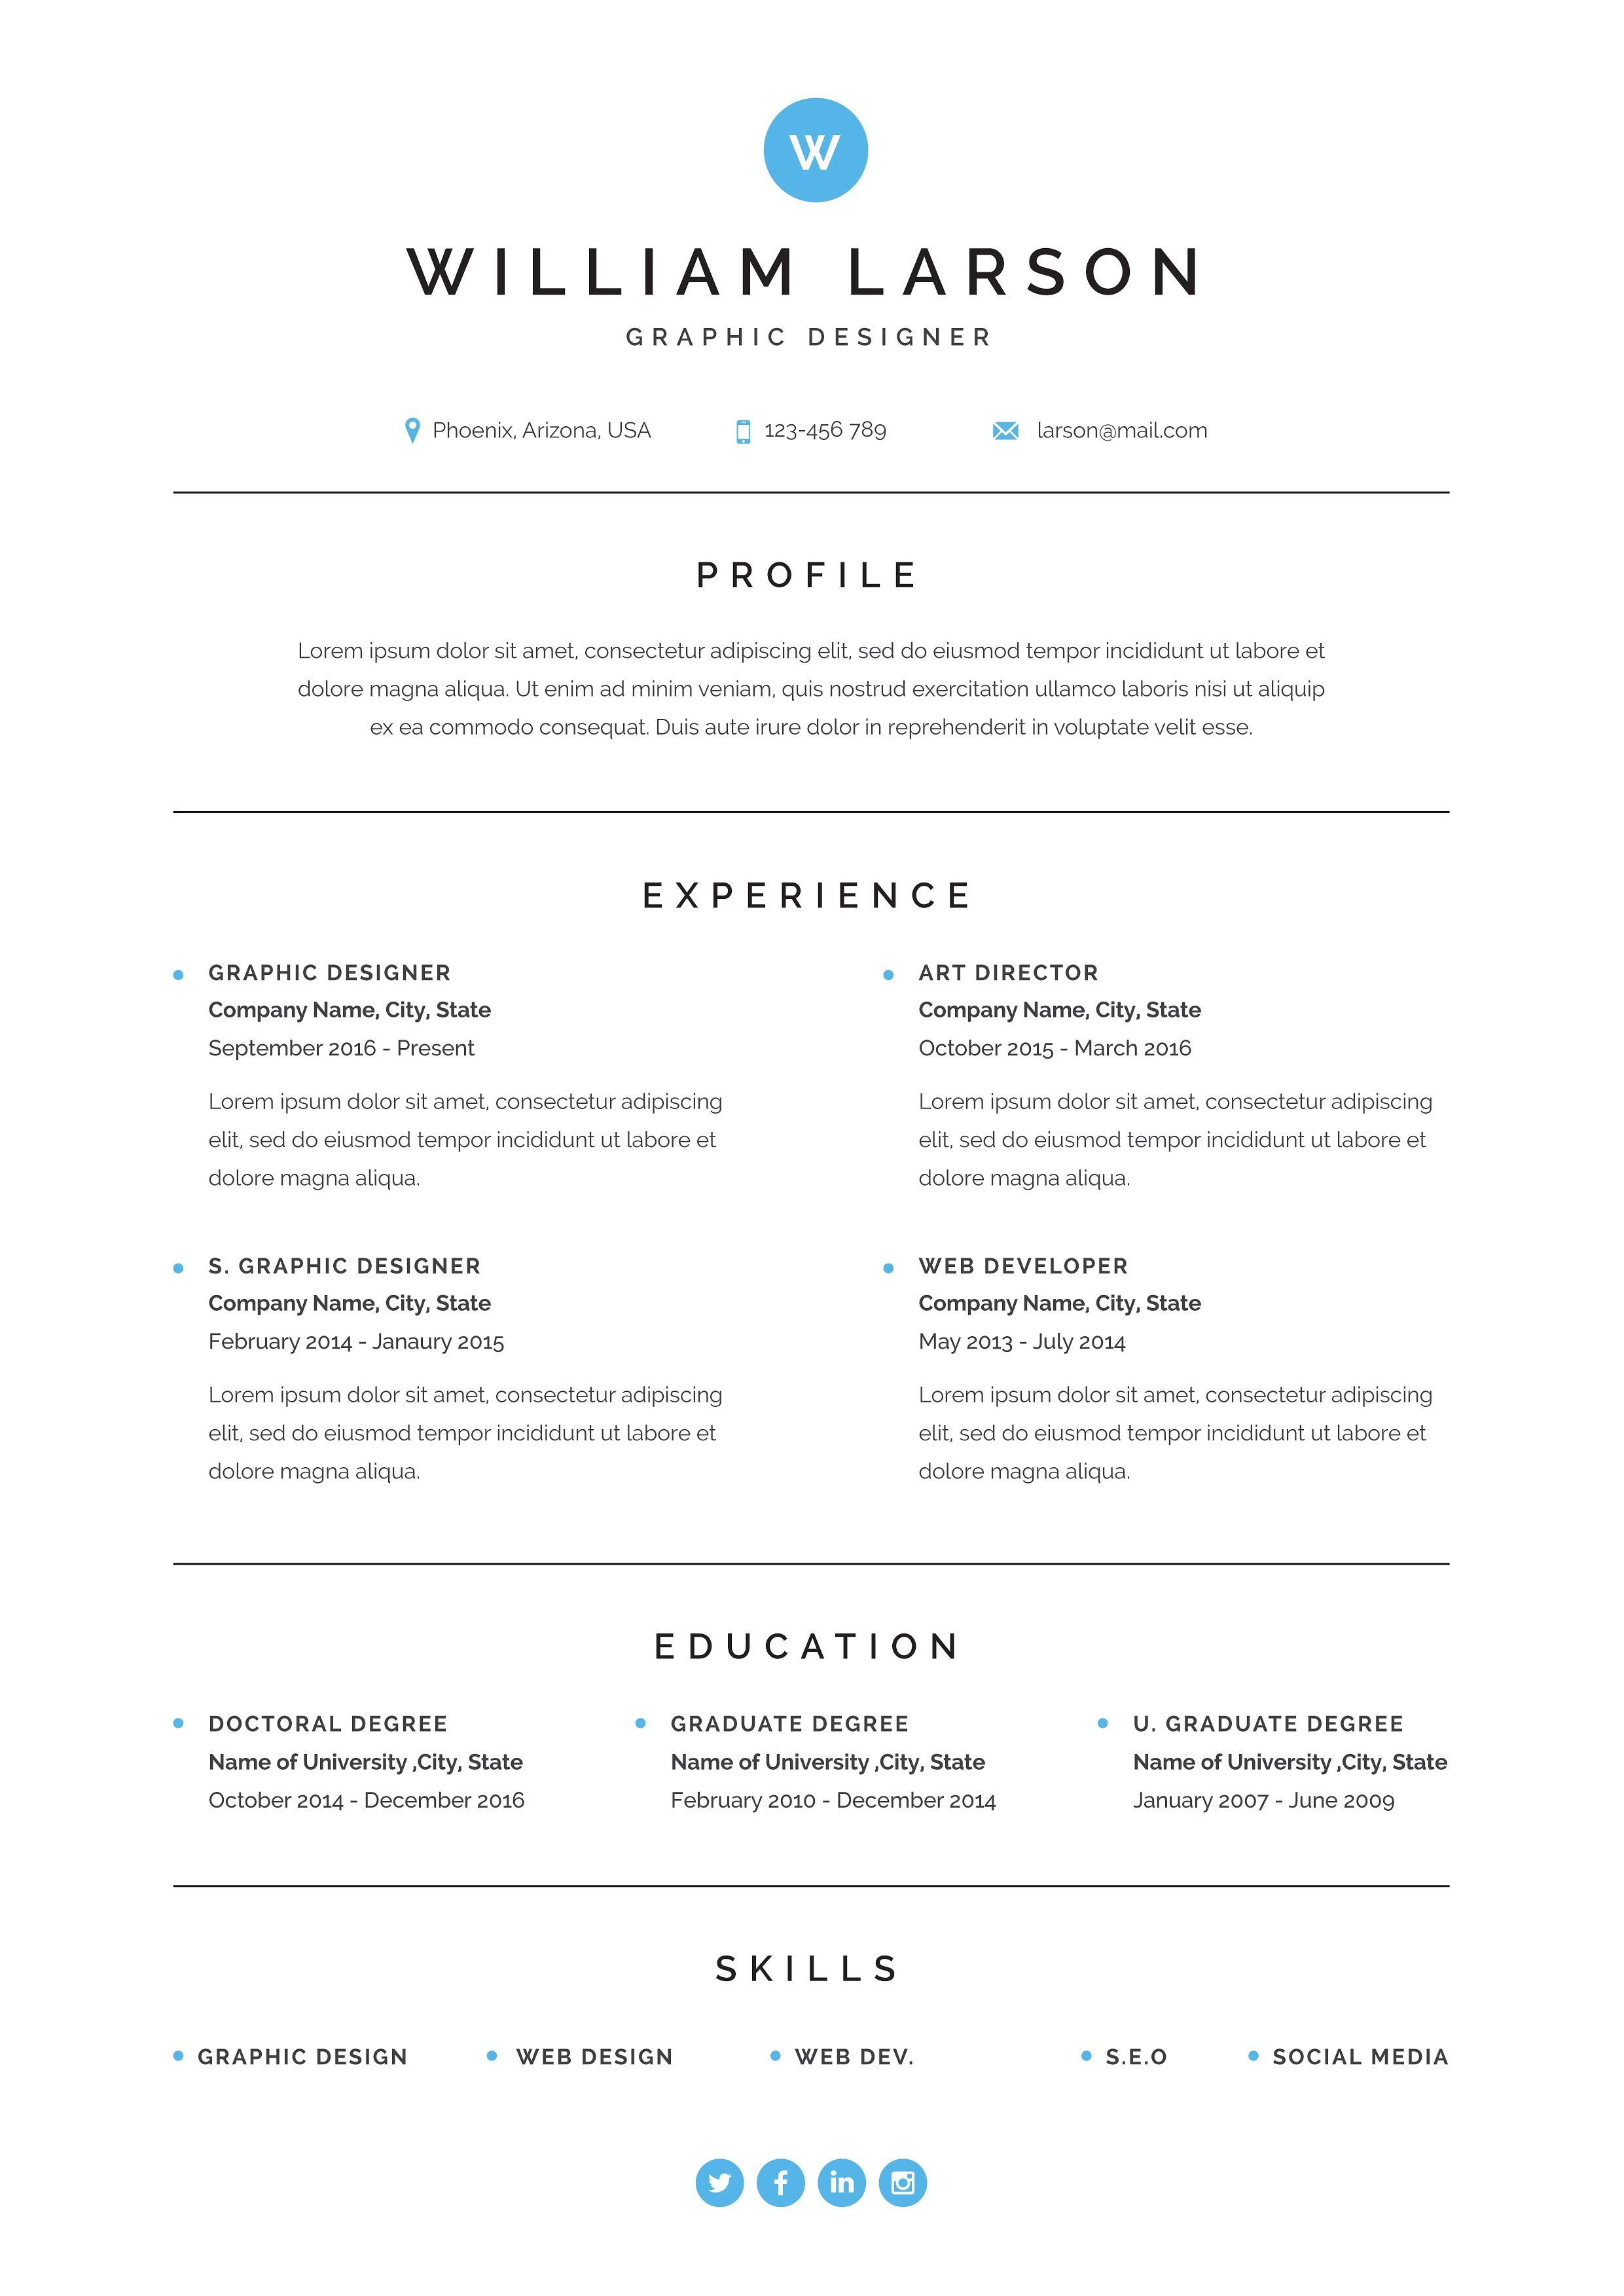 Minimal Resume | Title Block Exampls | Resume design